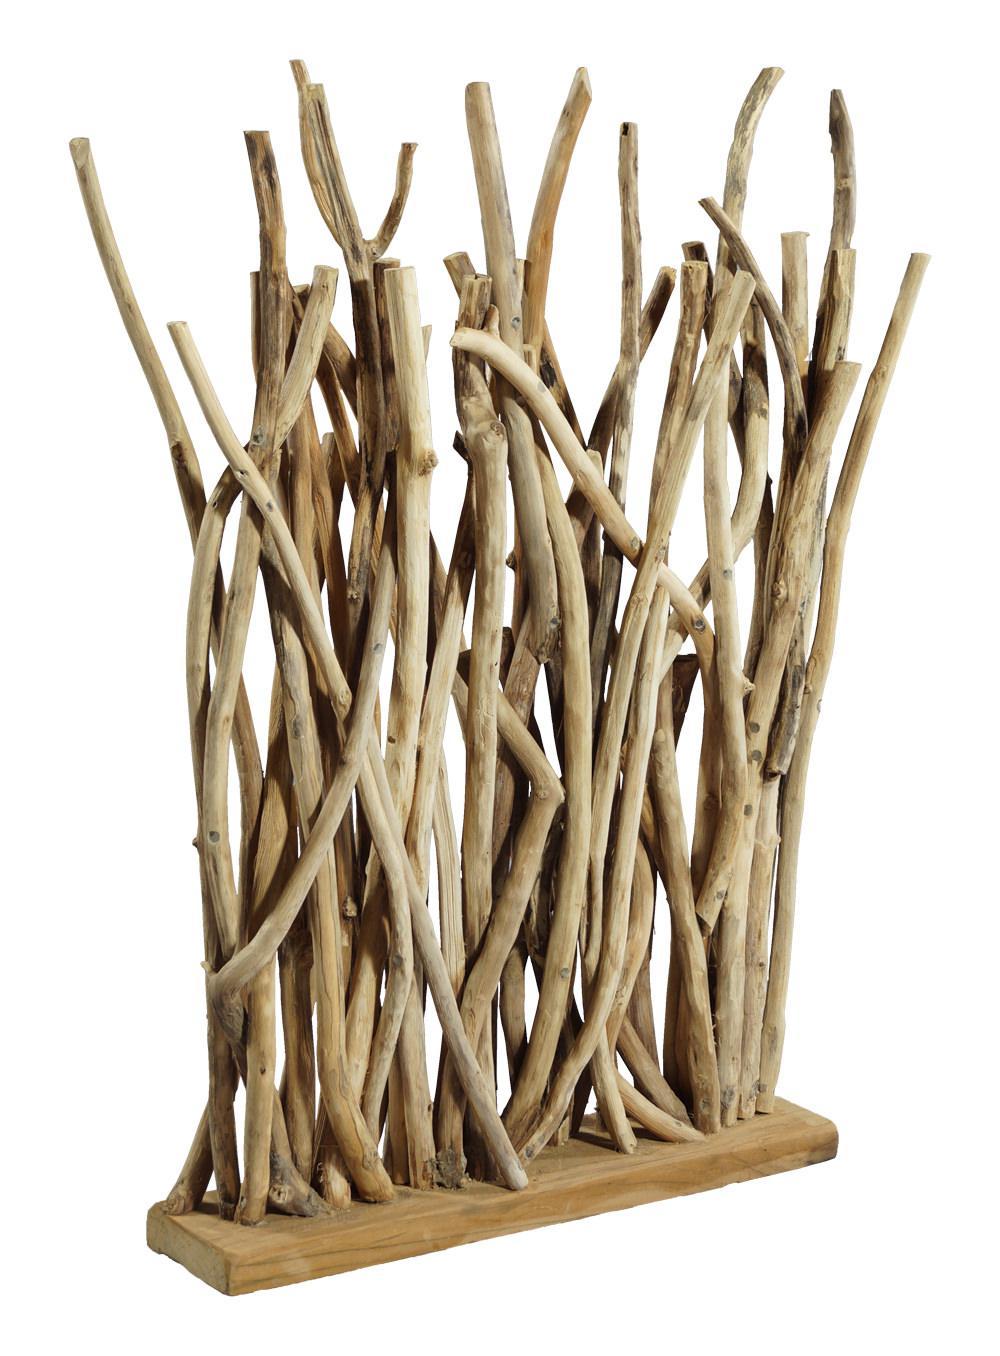 wohndekoration teakholz skulptur ste aus teak treibholz. Black Bedroom Furniture Sets. Home Design Ideas